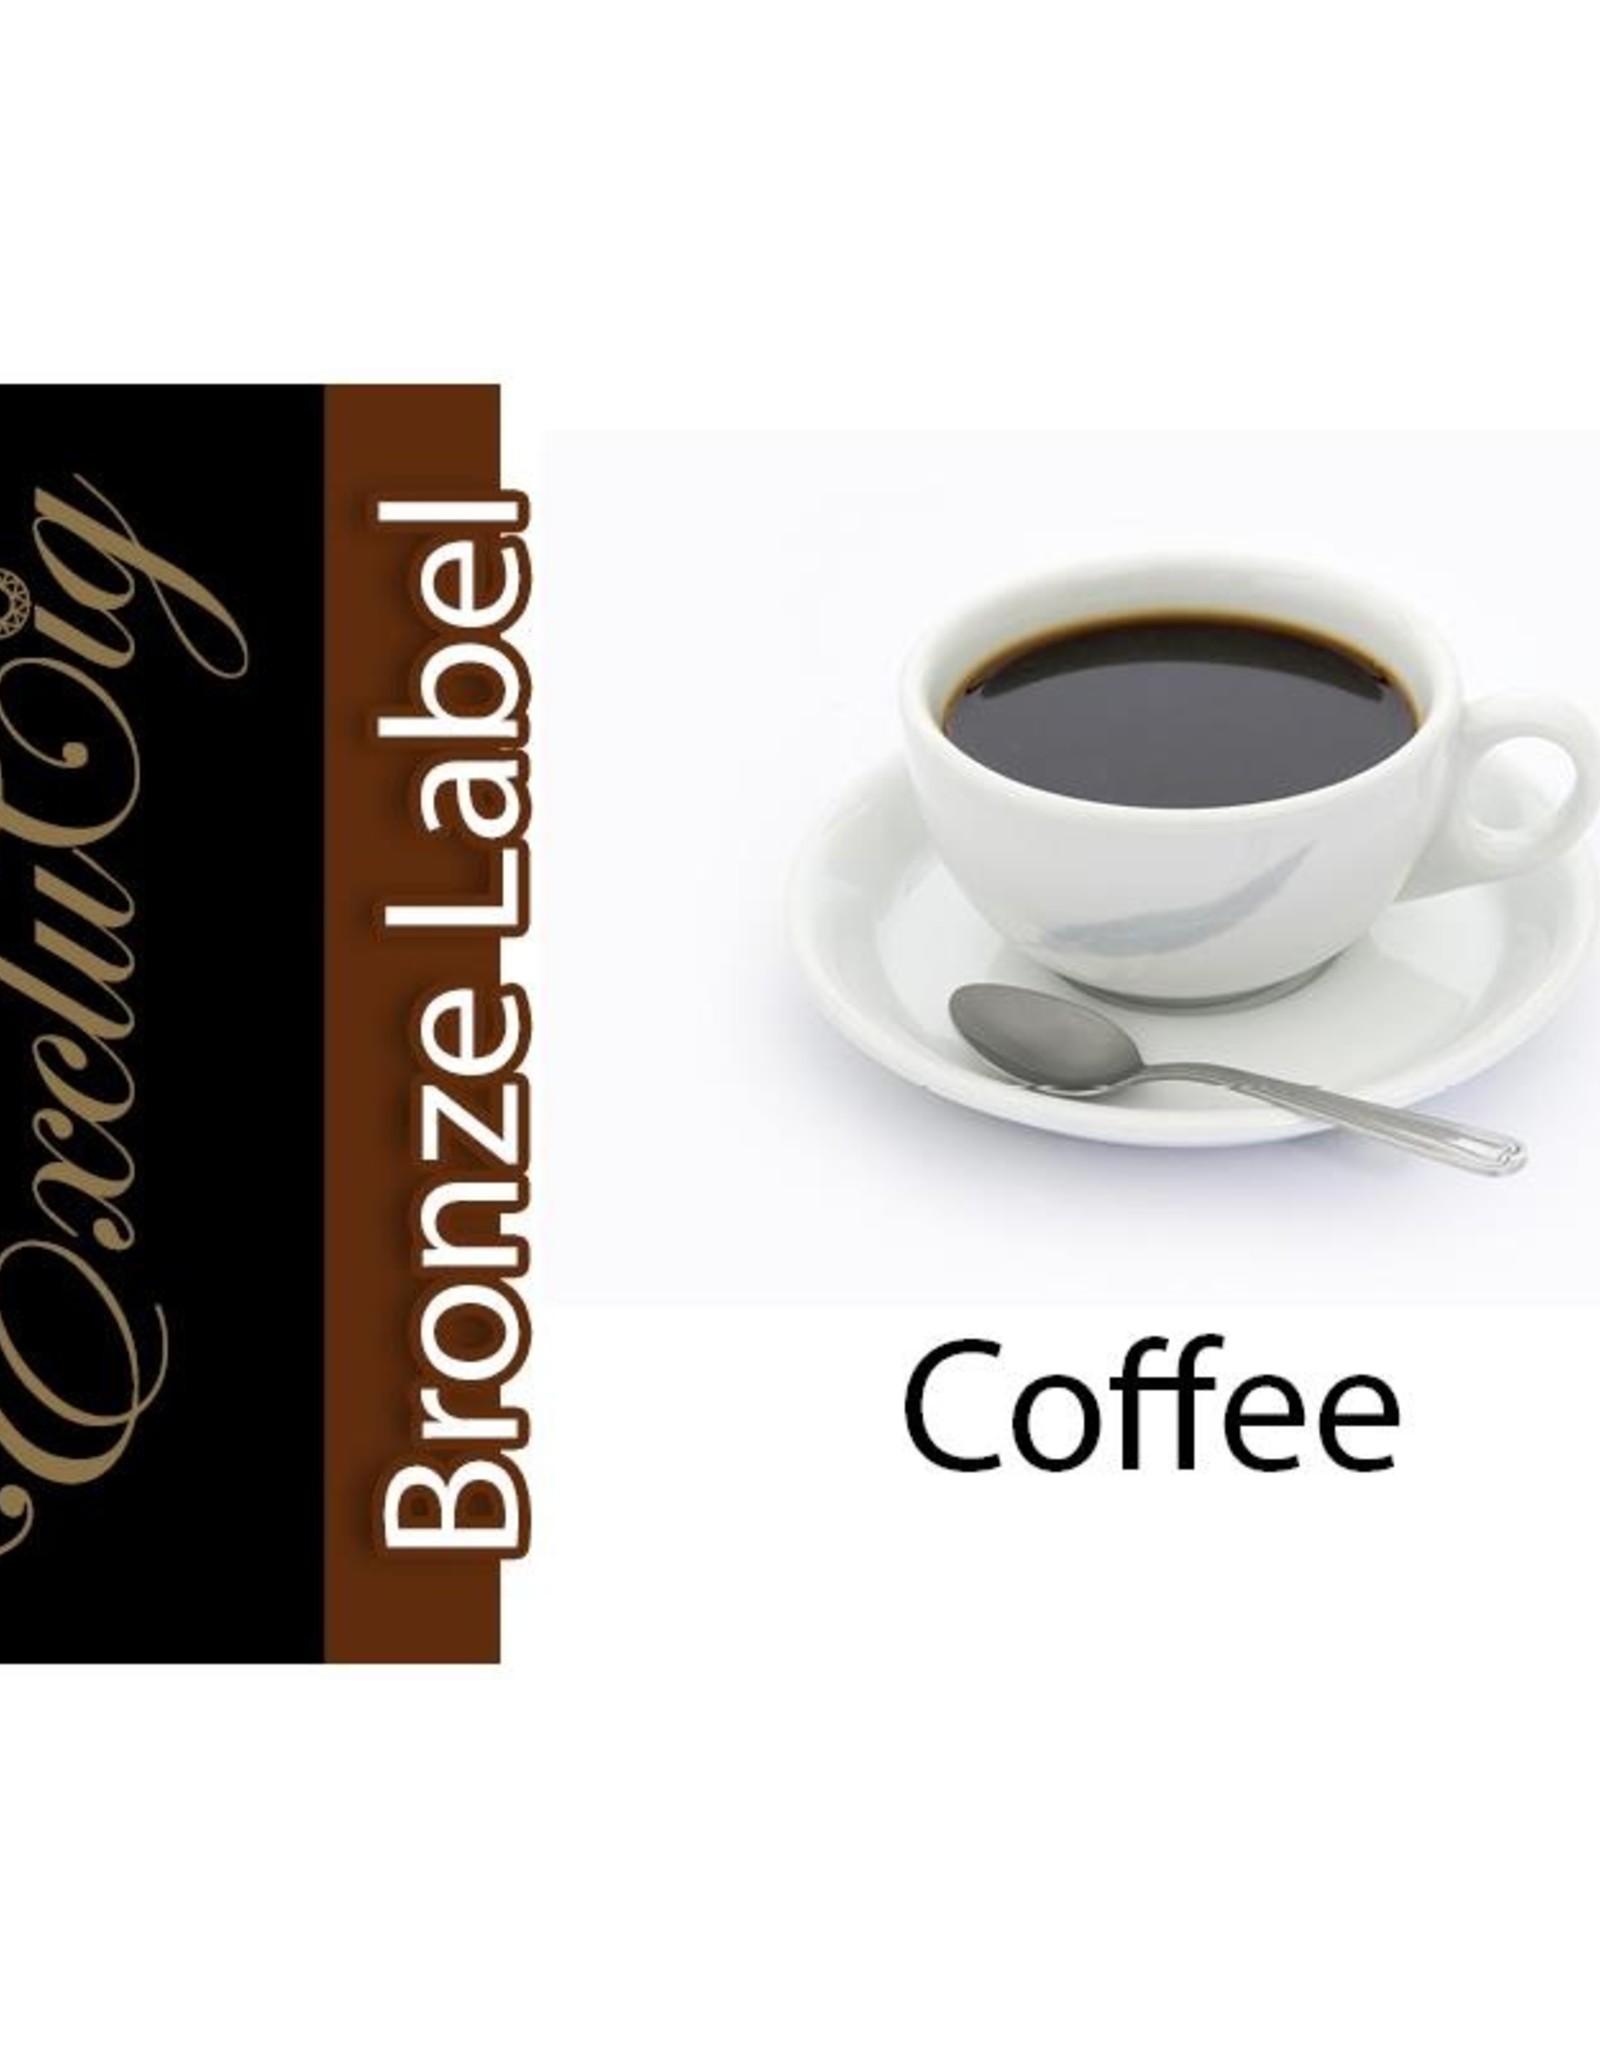 Exclucig Exclucig Bronze Label E-liquid Coffee 6 mg Nicotine